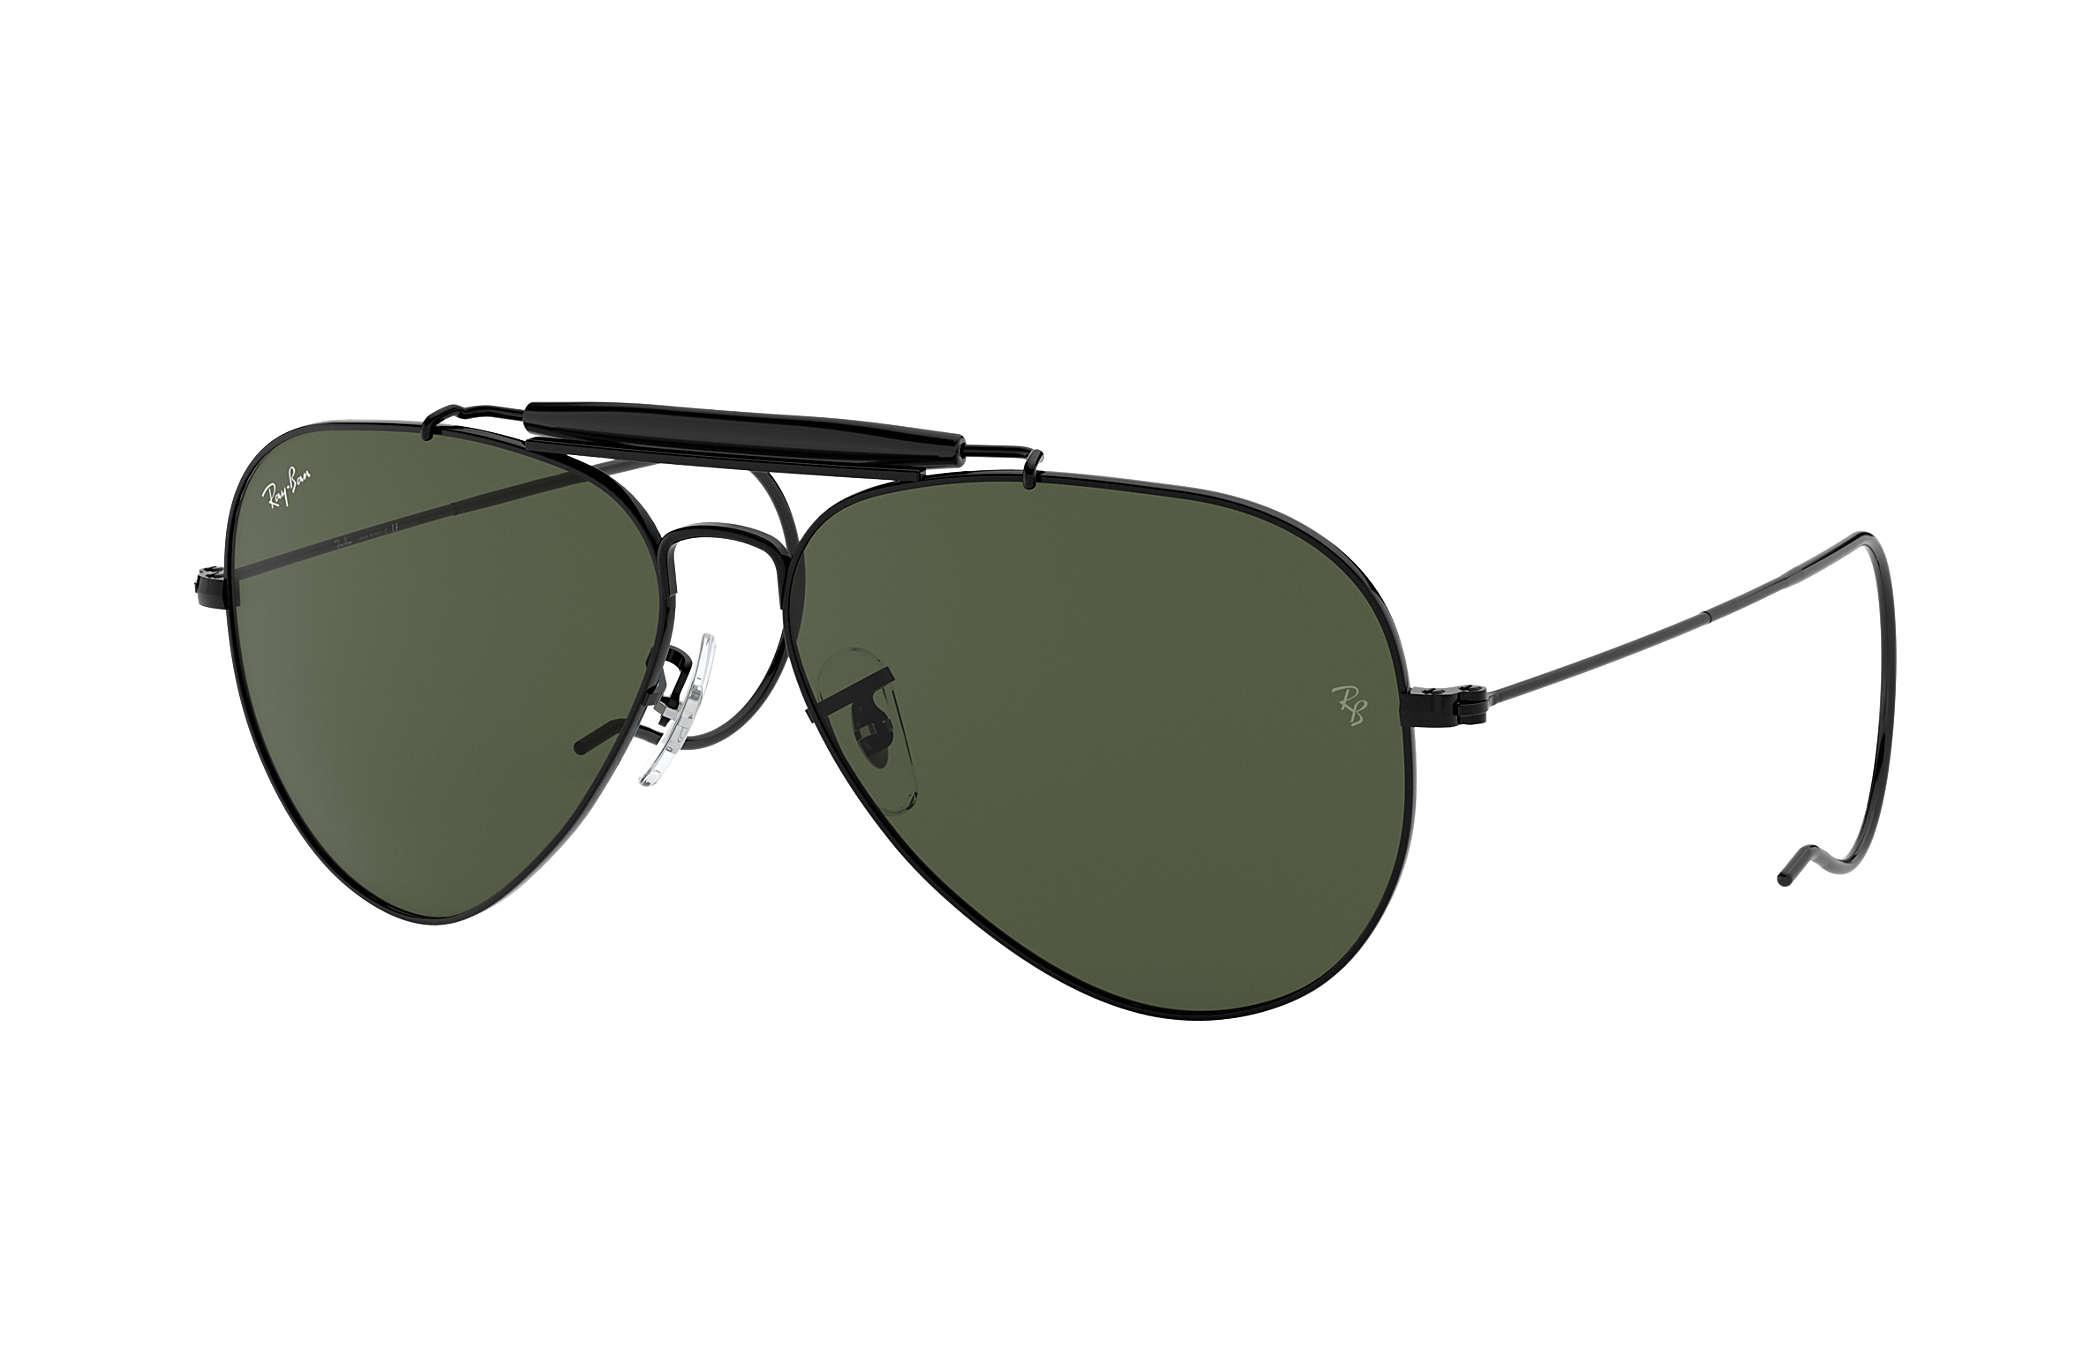 ray ban sportsman sunglasses